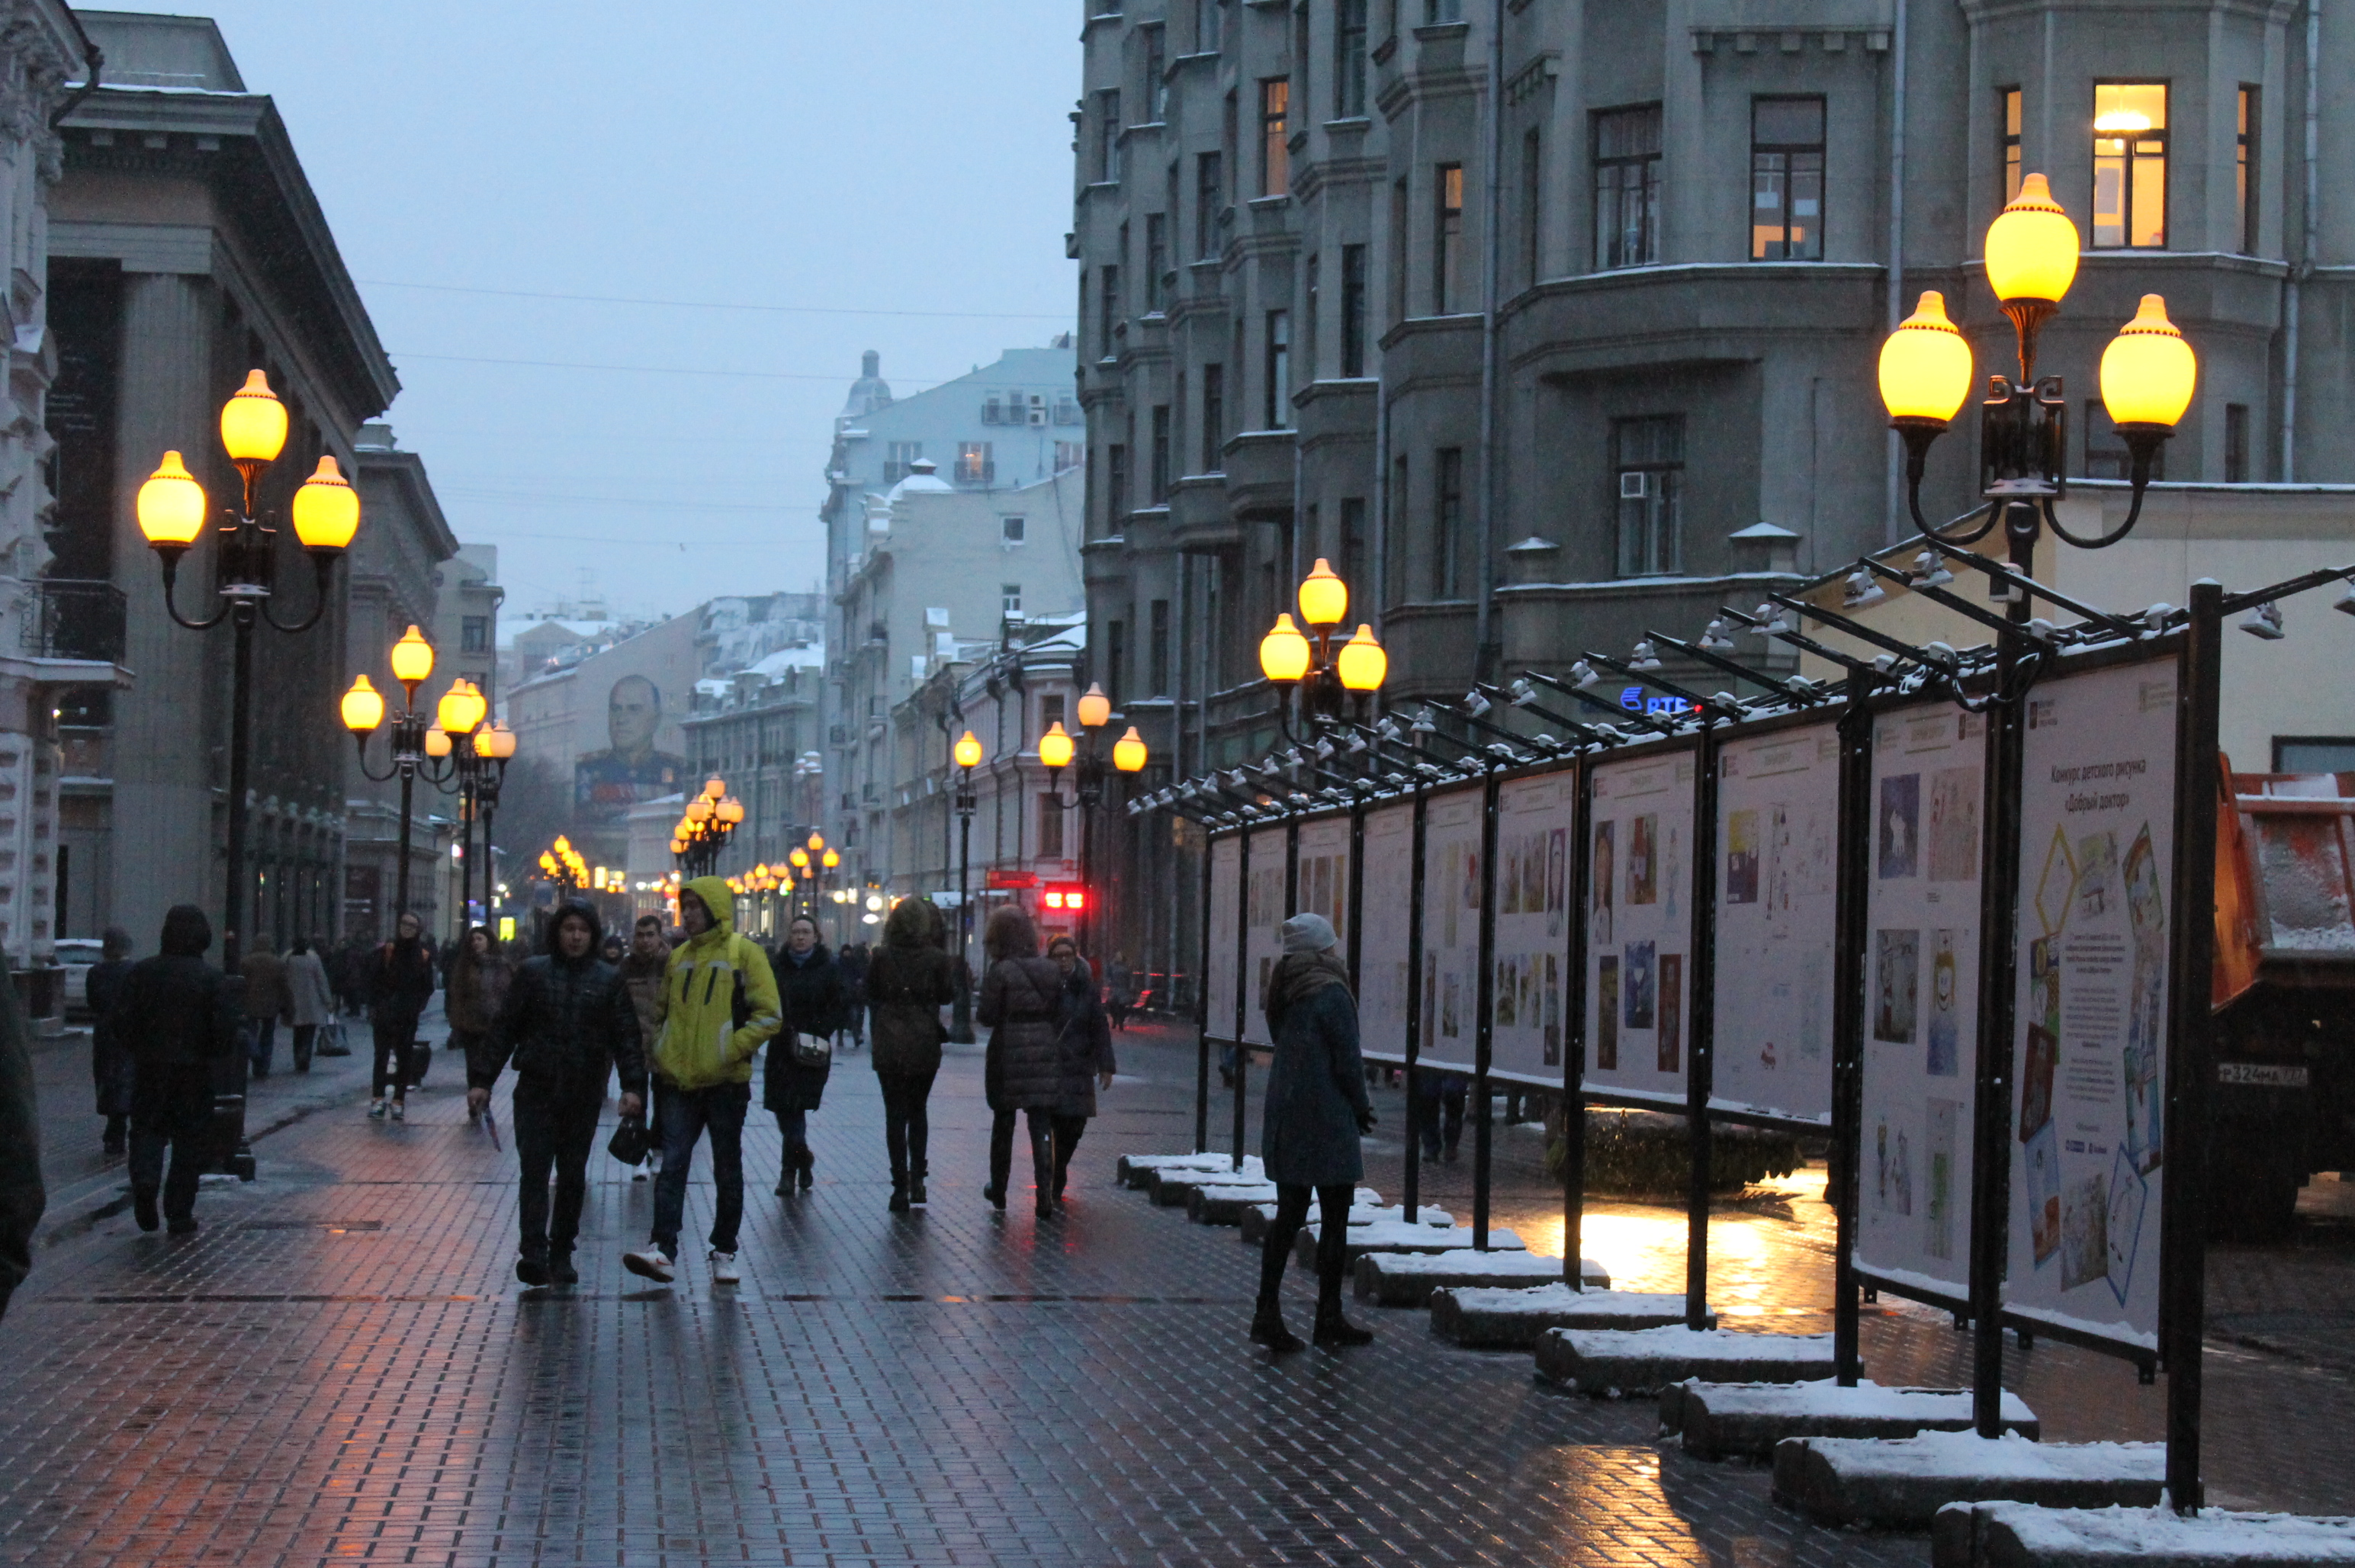 картинка люди на улице москвы туда можно лодке